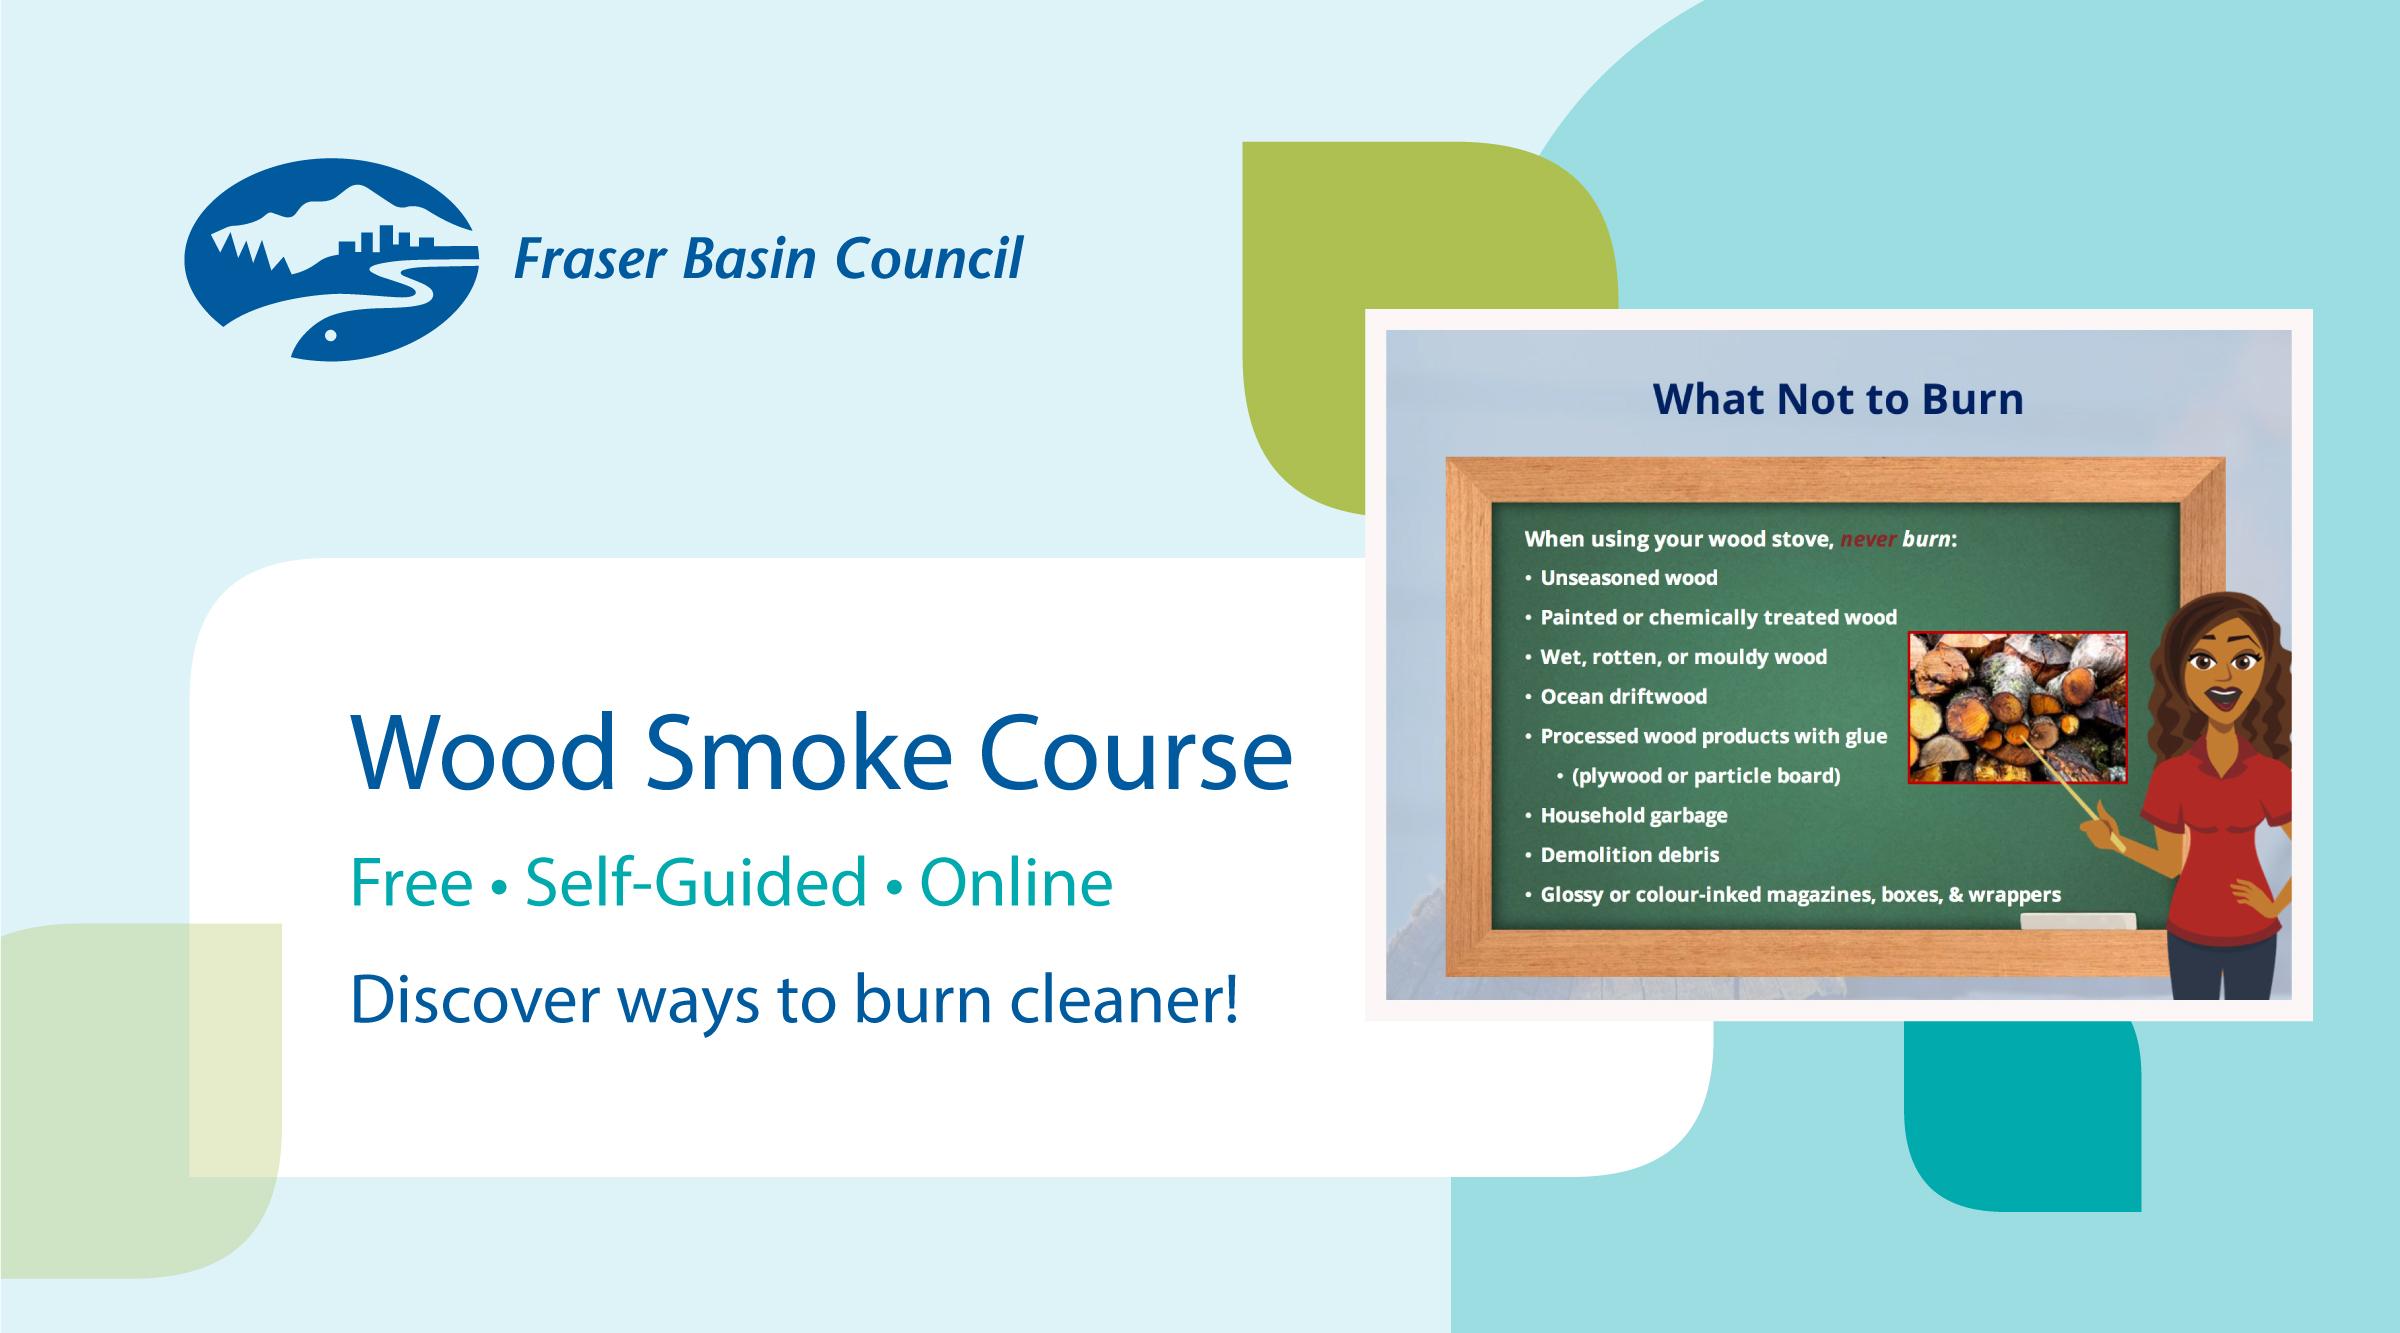 UFR/Wood-Smoke-Course-Graphic_2400.jpg